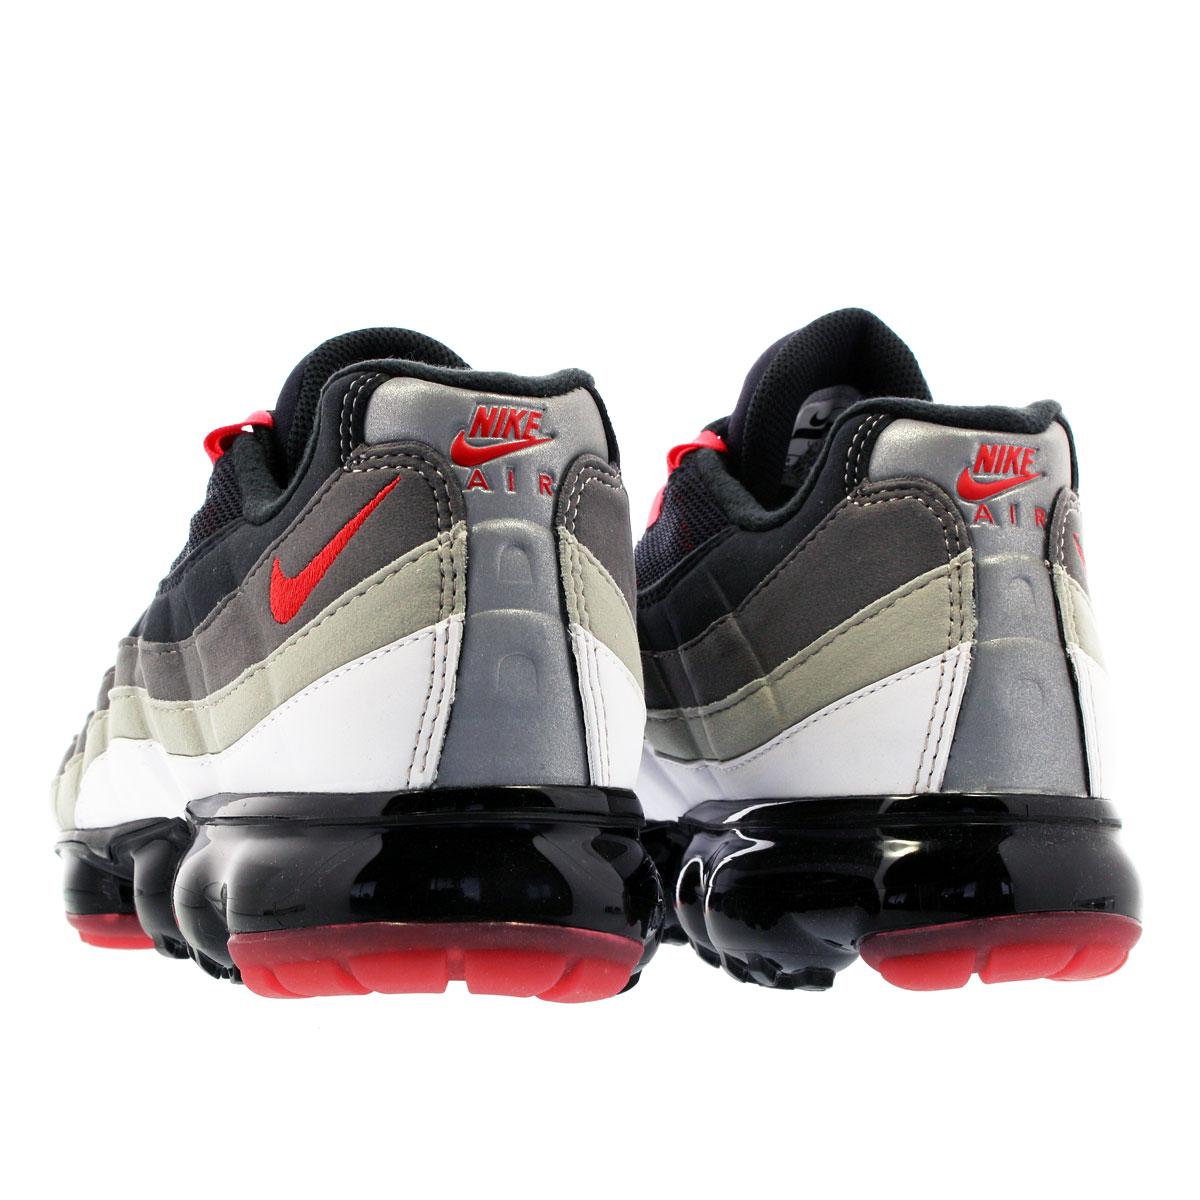 NIKE AIR VAPORMAX 95 Nike air vapor max 95 WHITEHOT REDDARK PEWTERGRANITE aj7292 101